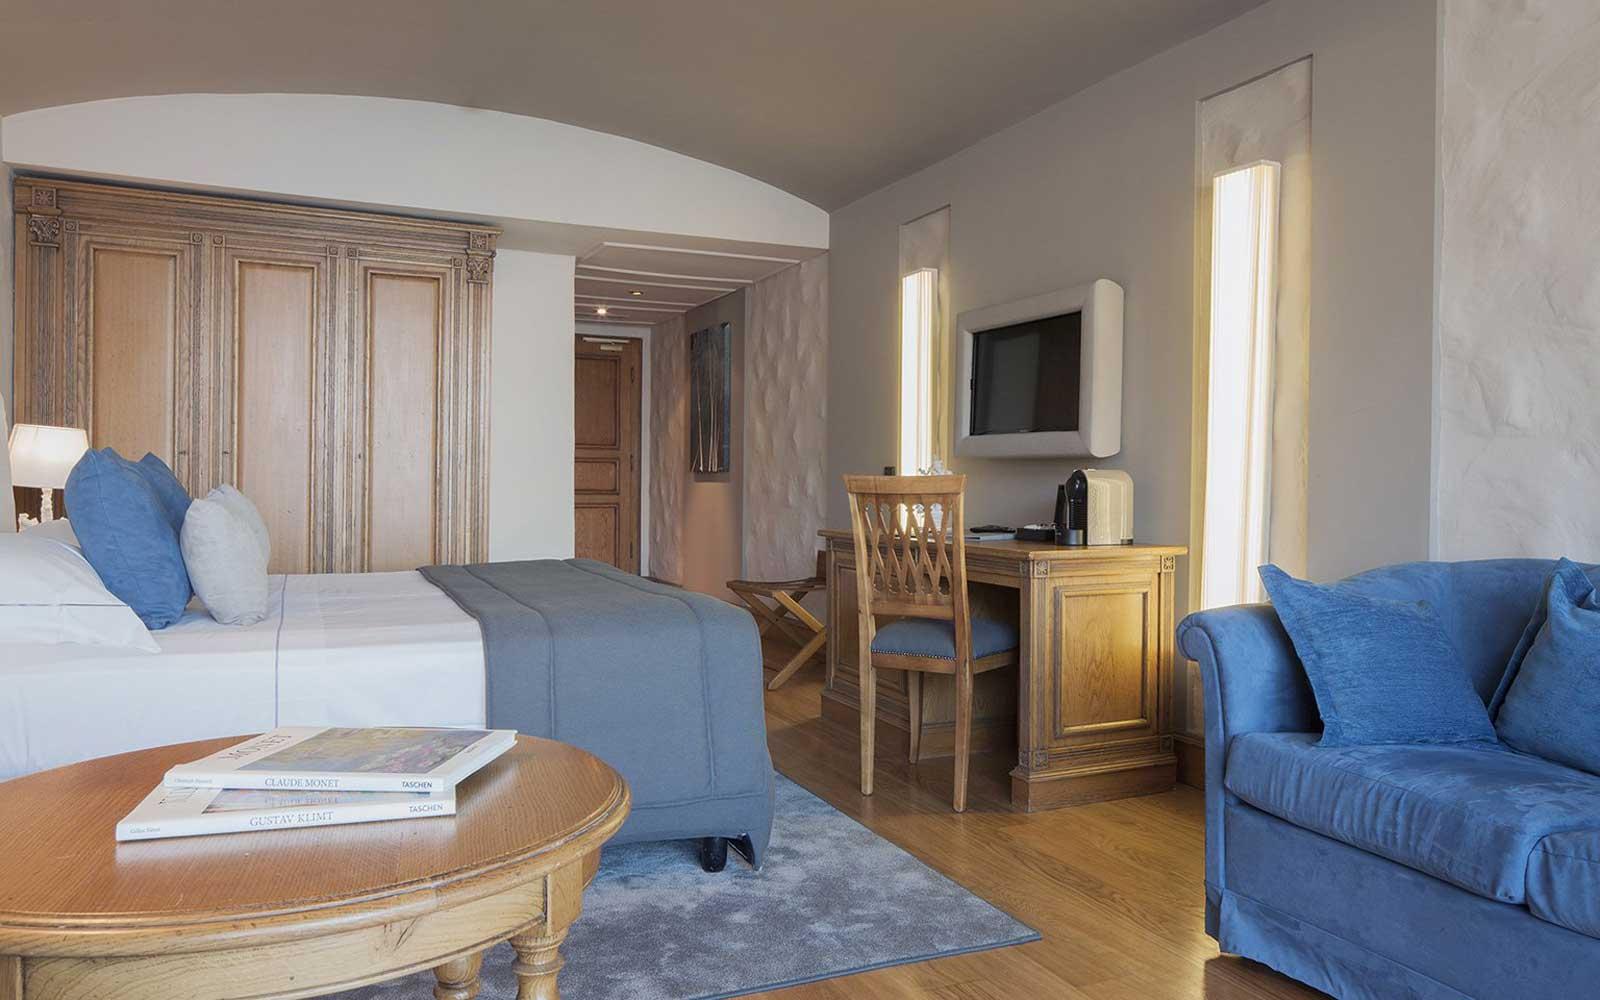 Junior Suite at Grand Hotel Mazzaro Sea Palace